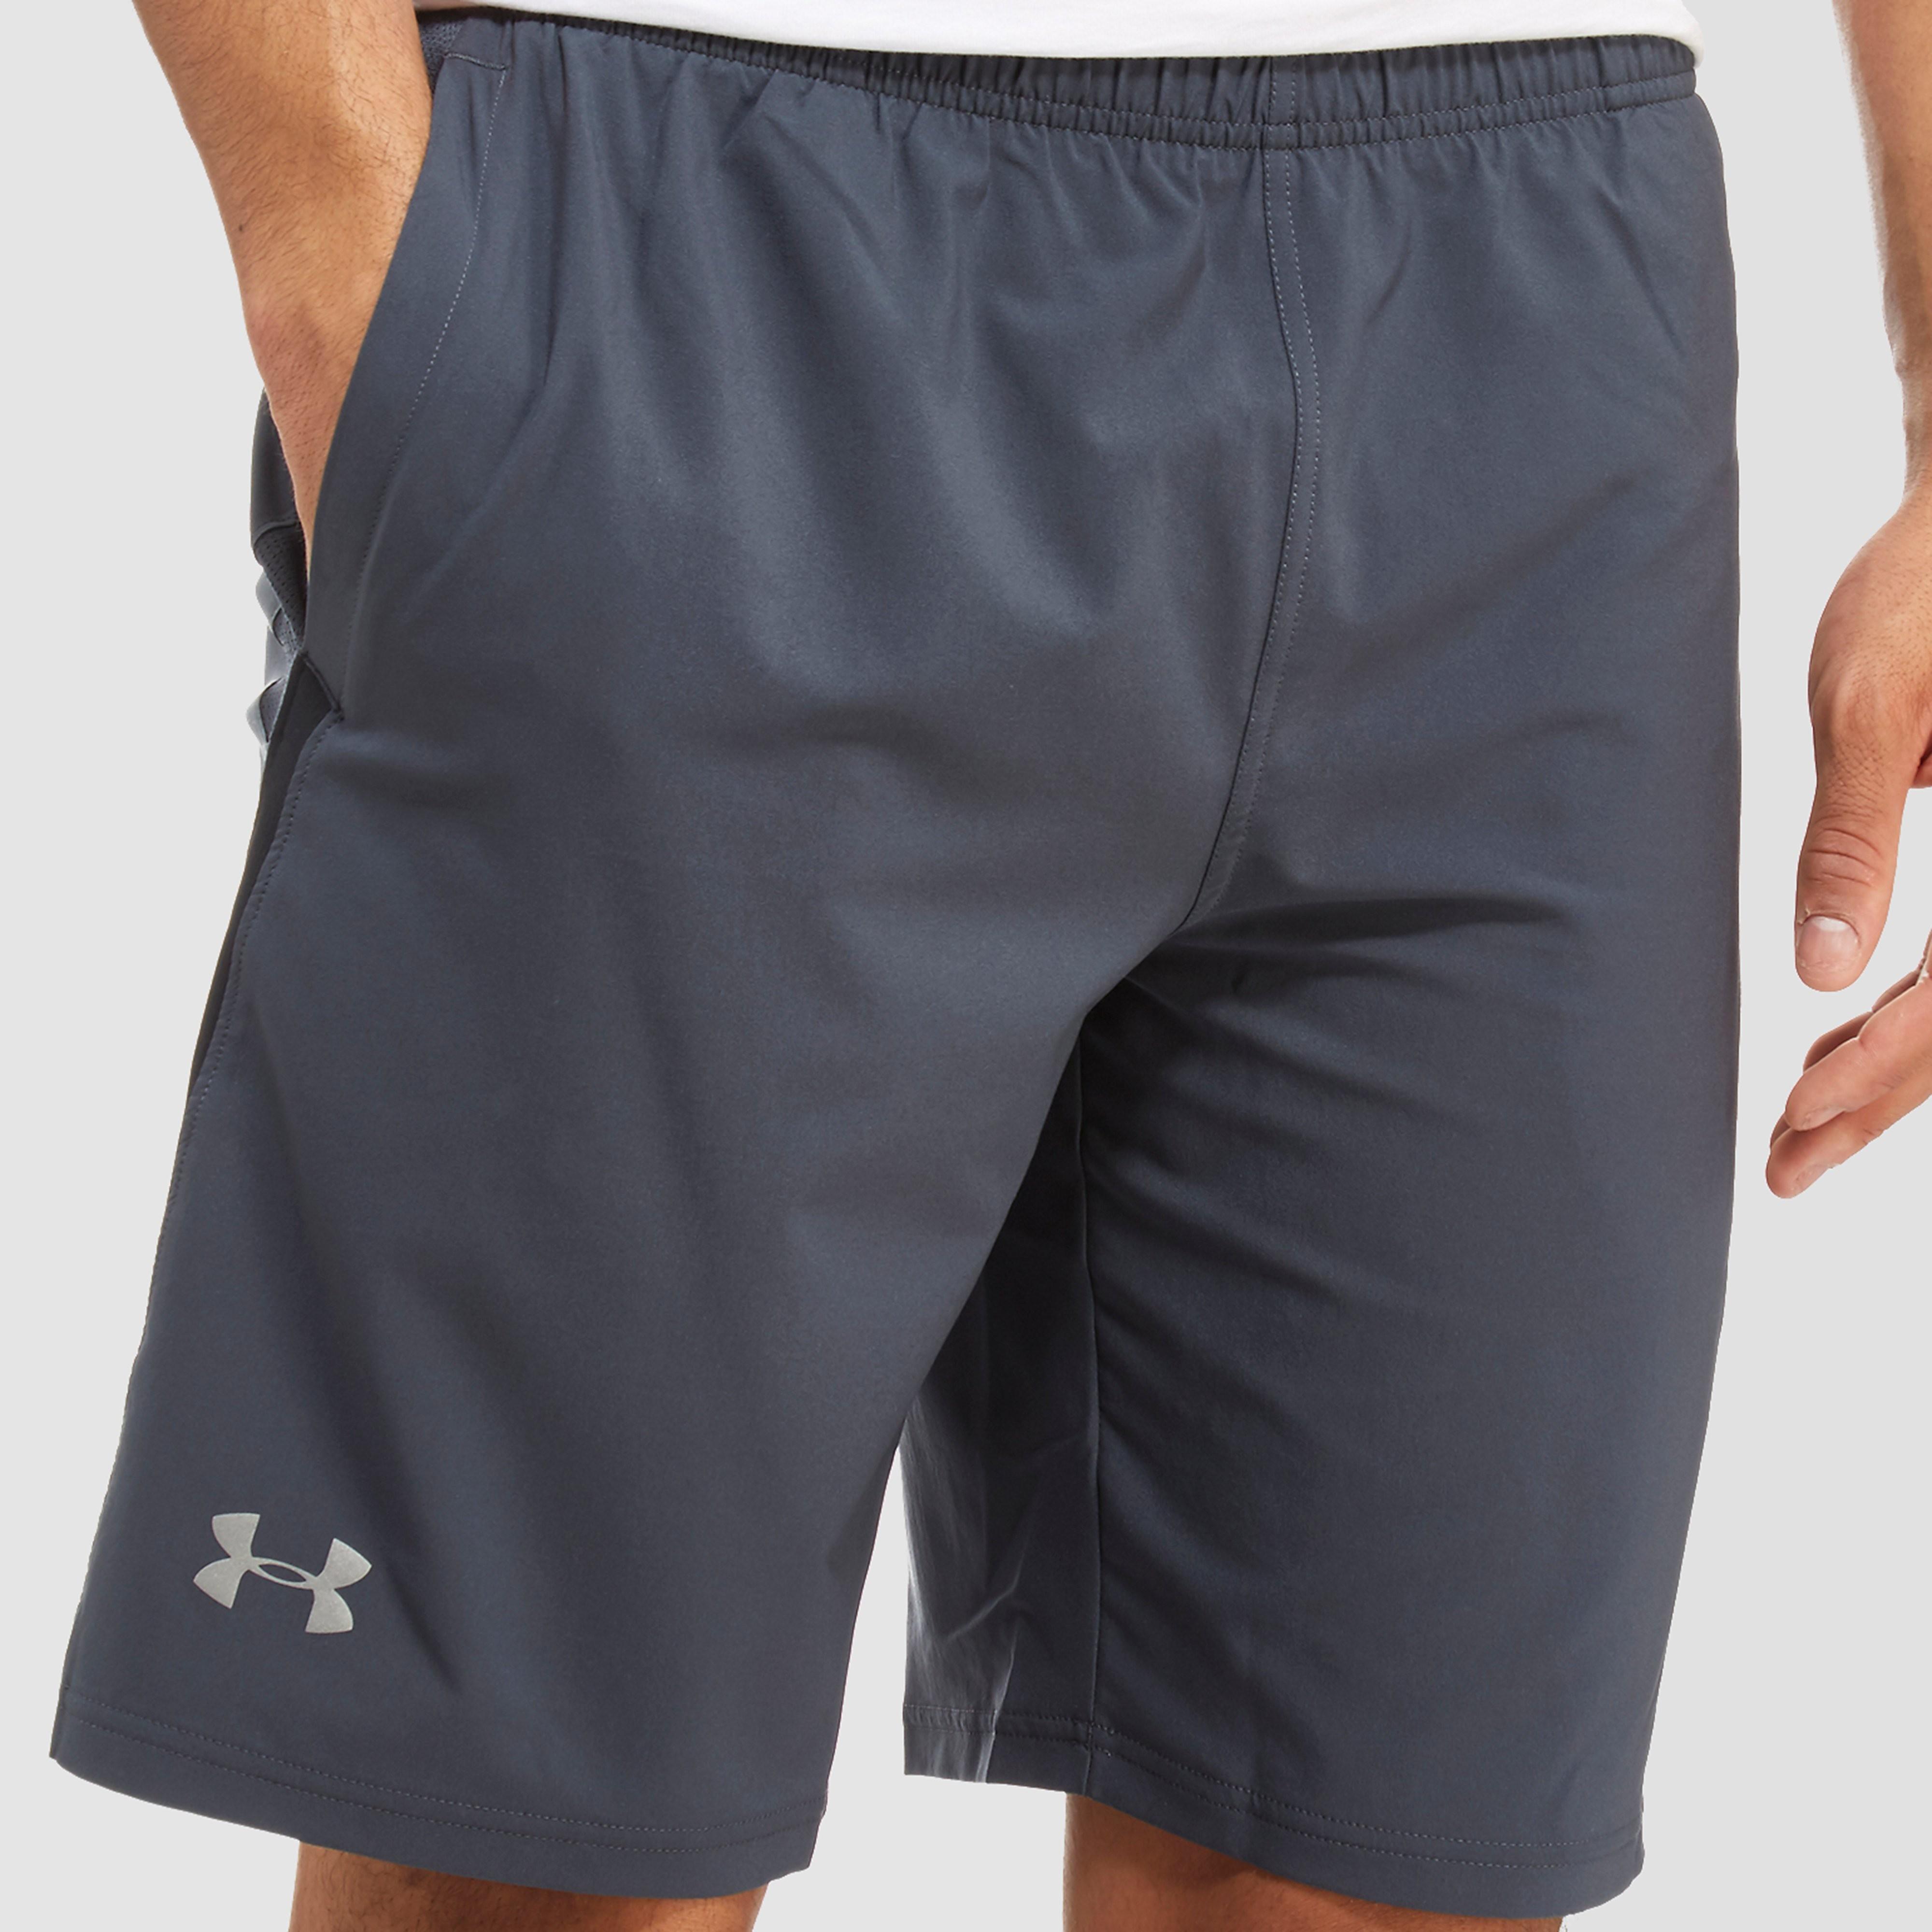 Under Armour Launch Men's Running Shorts